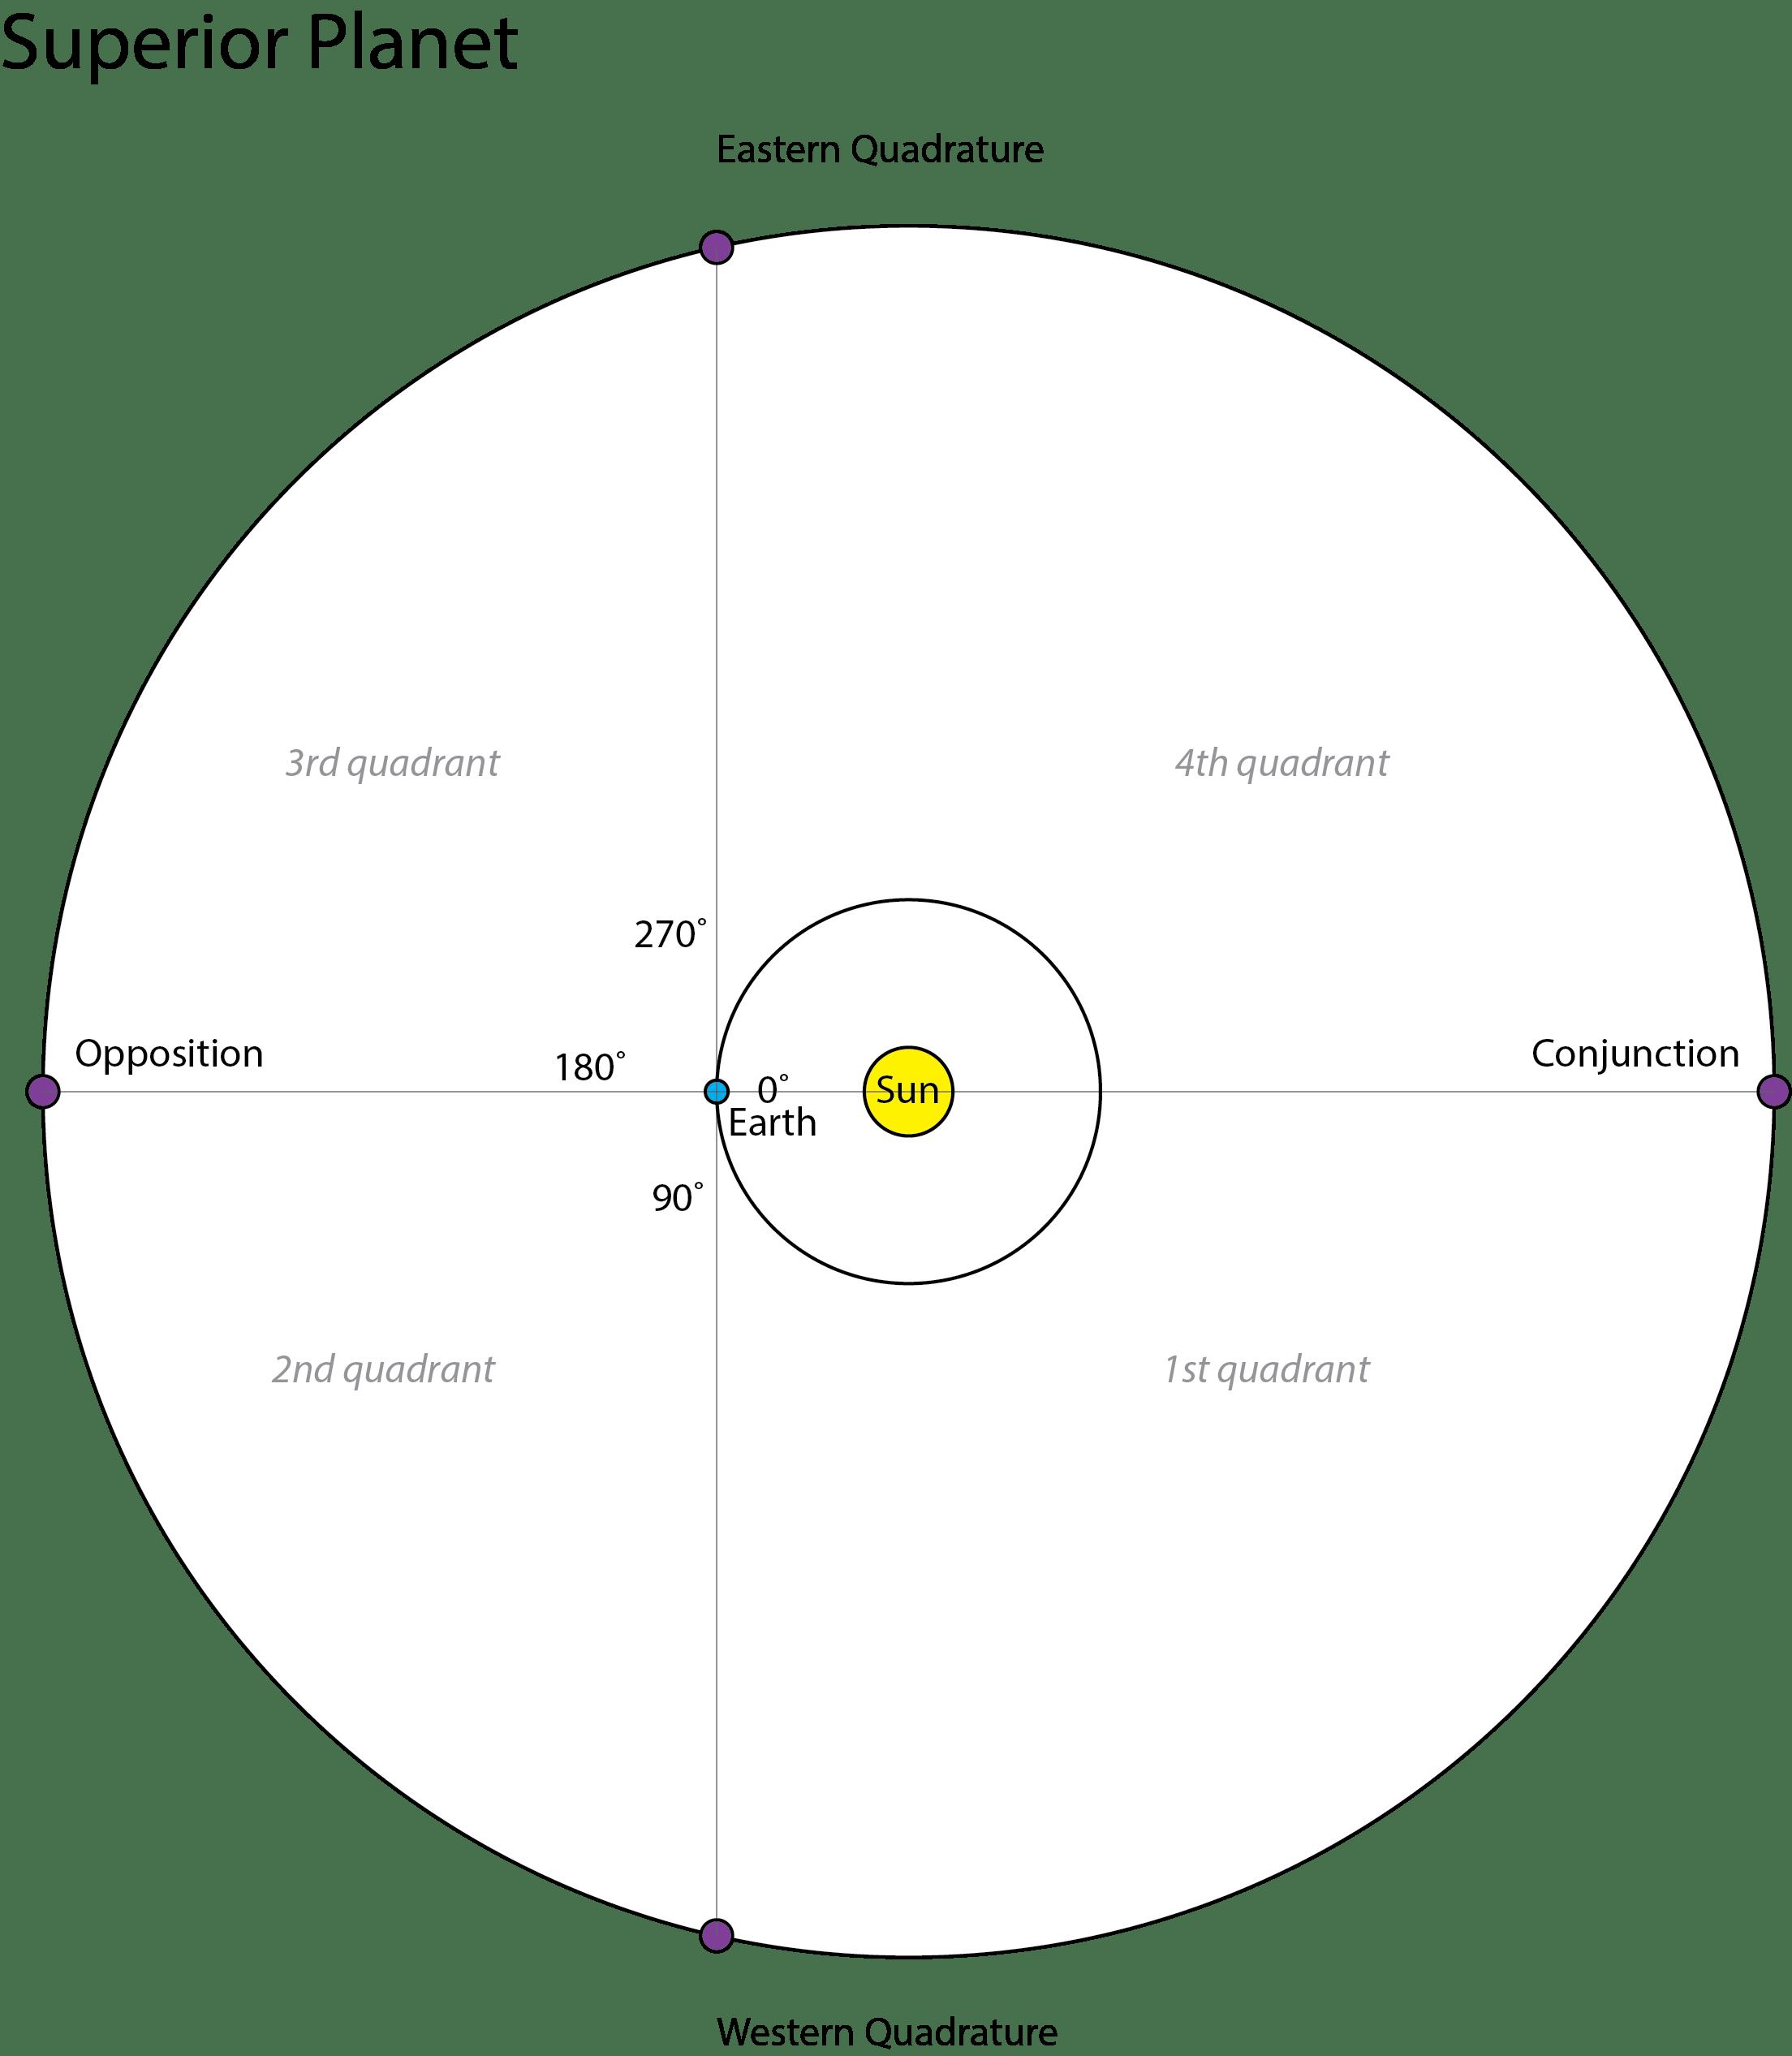 Saturn at Eastern Quadrature